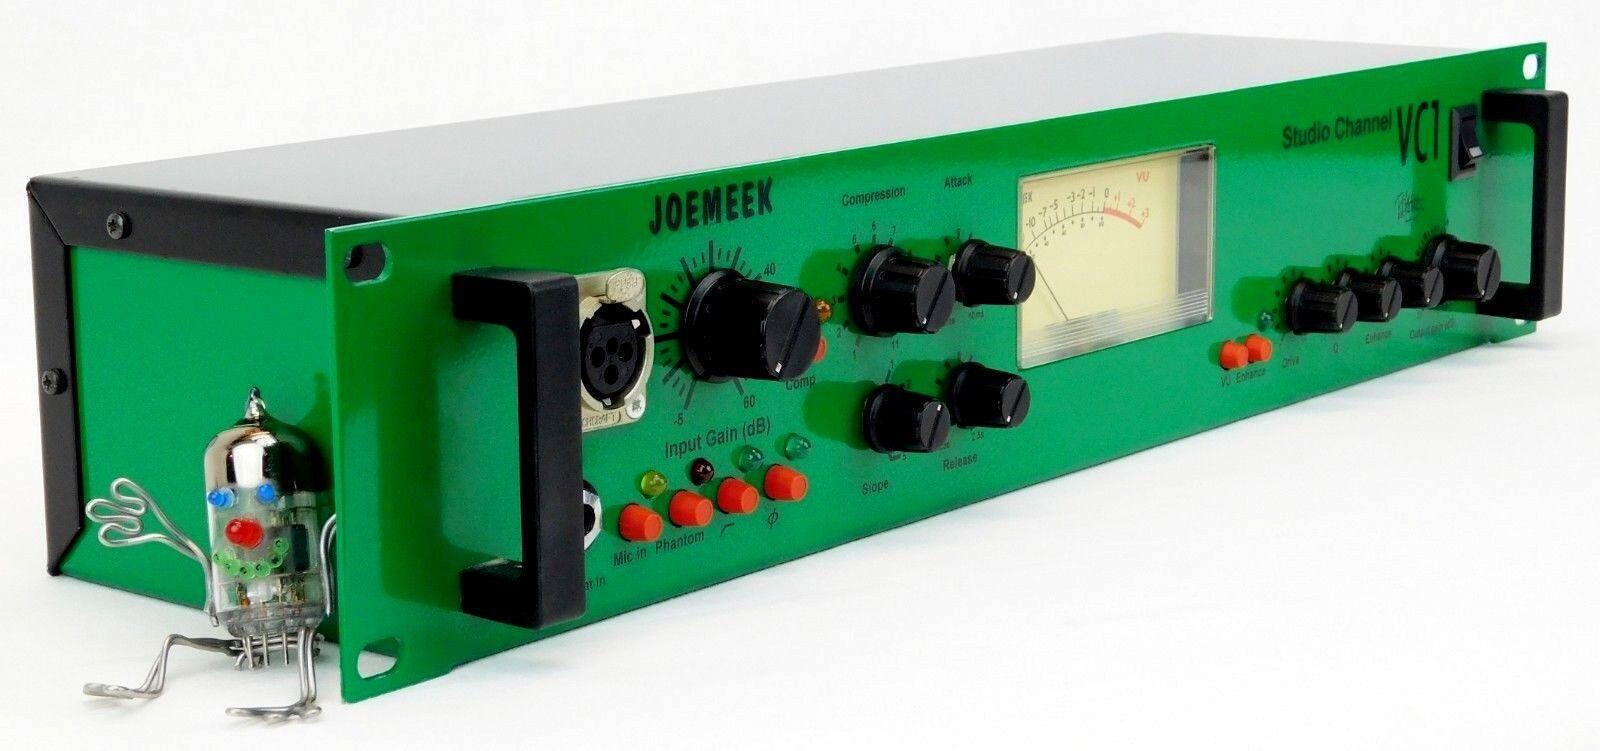 JoeMeek VC1 V3.03 Studio Channel Mic Preamp Compressor + Neuwertig + Garantie